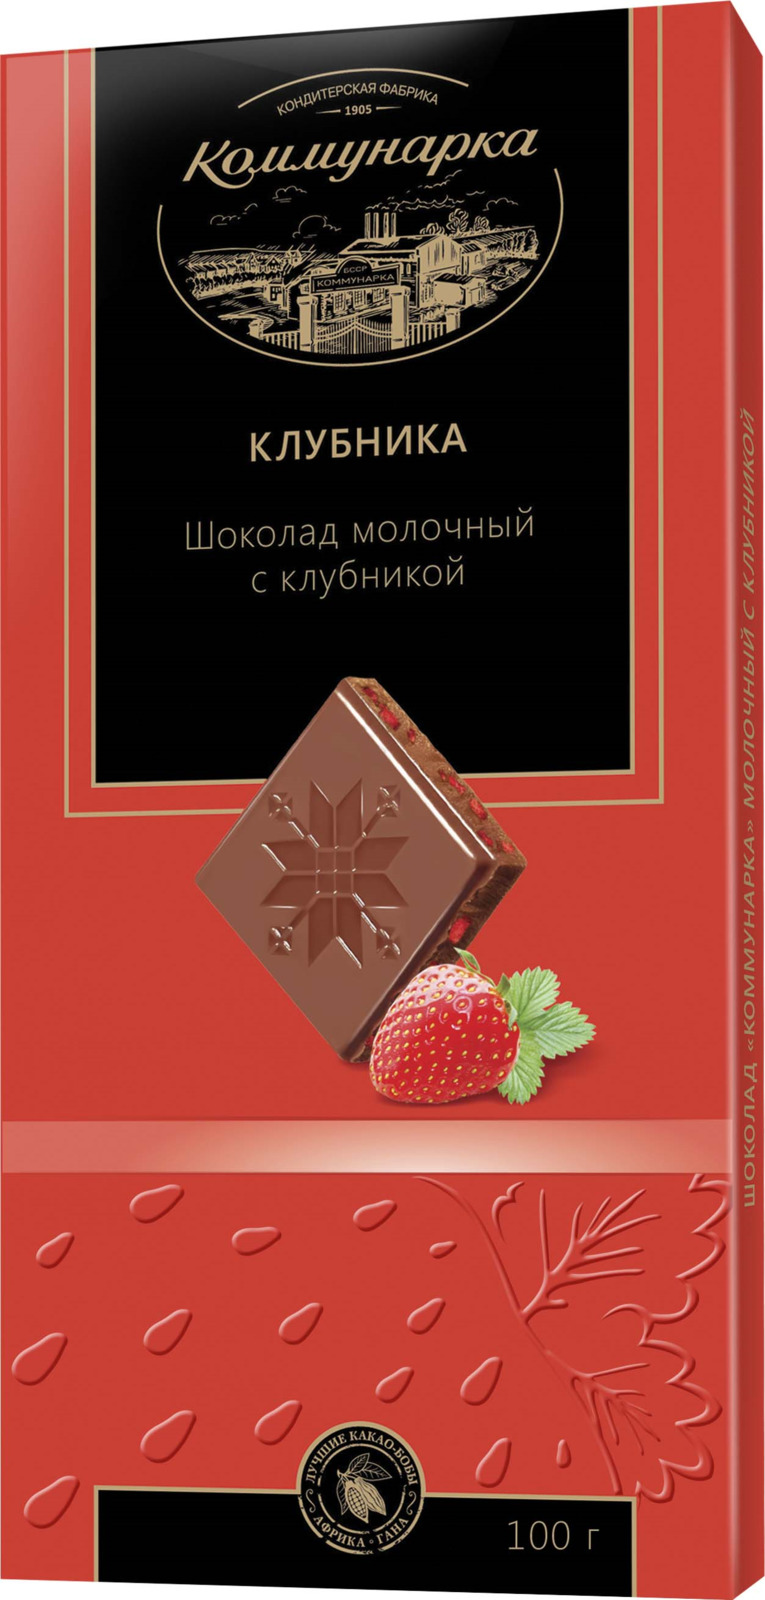 Шоколад Коммунарка, молочный, с клубникой, 100 г коммунарка шоколад молочный с кокосовой нугой 85 г